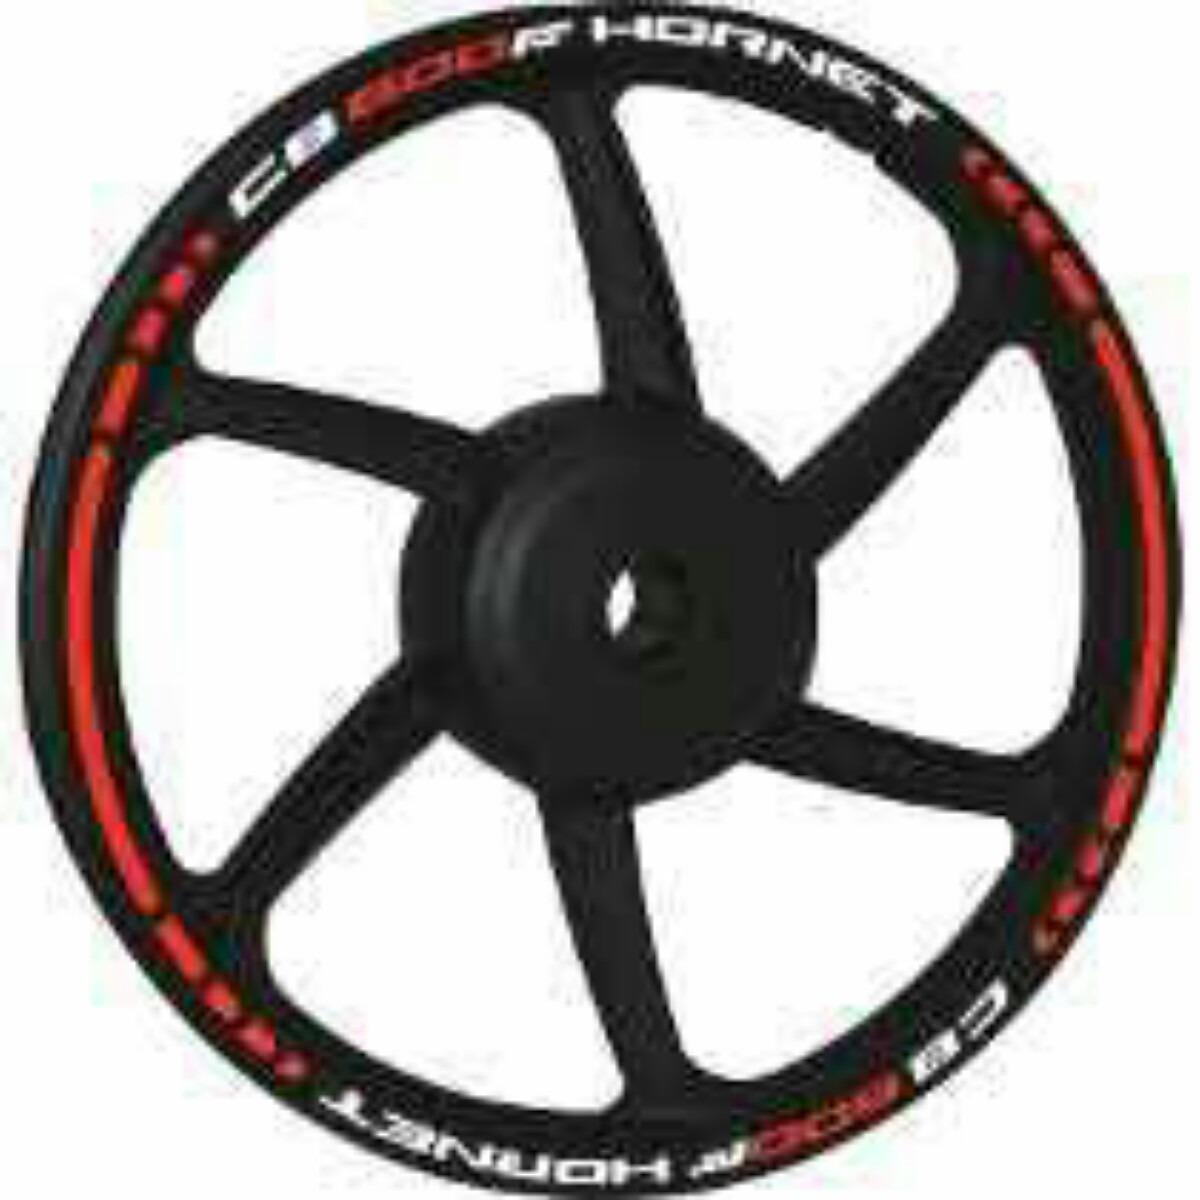 Adesivo De Roda Branco ~ Adesivo De Roda Cb600f Hornet R$ 79,90 no MercadoLivre